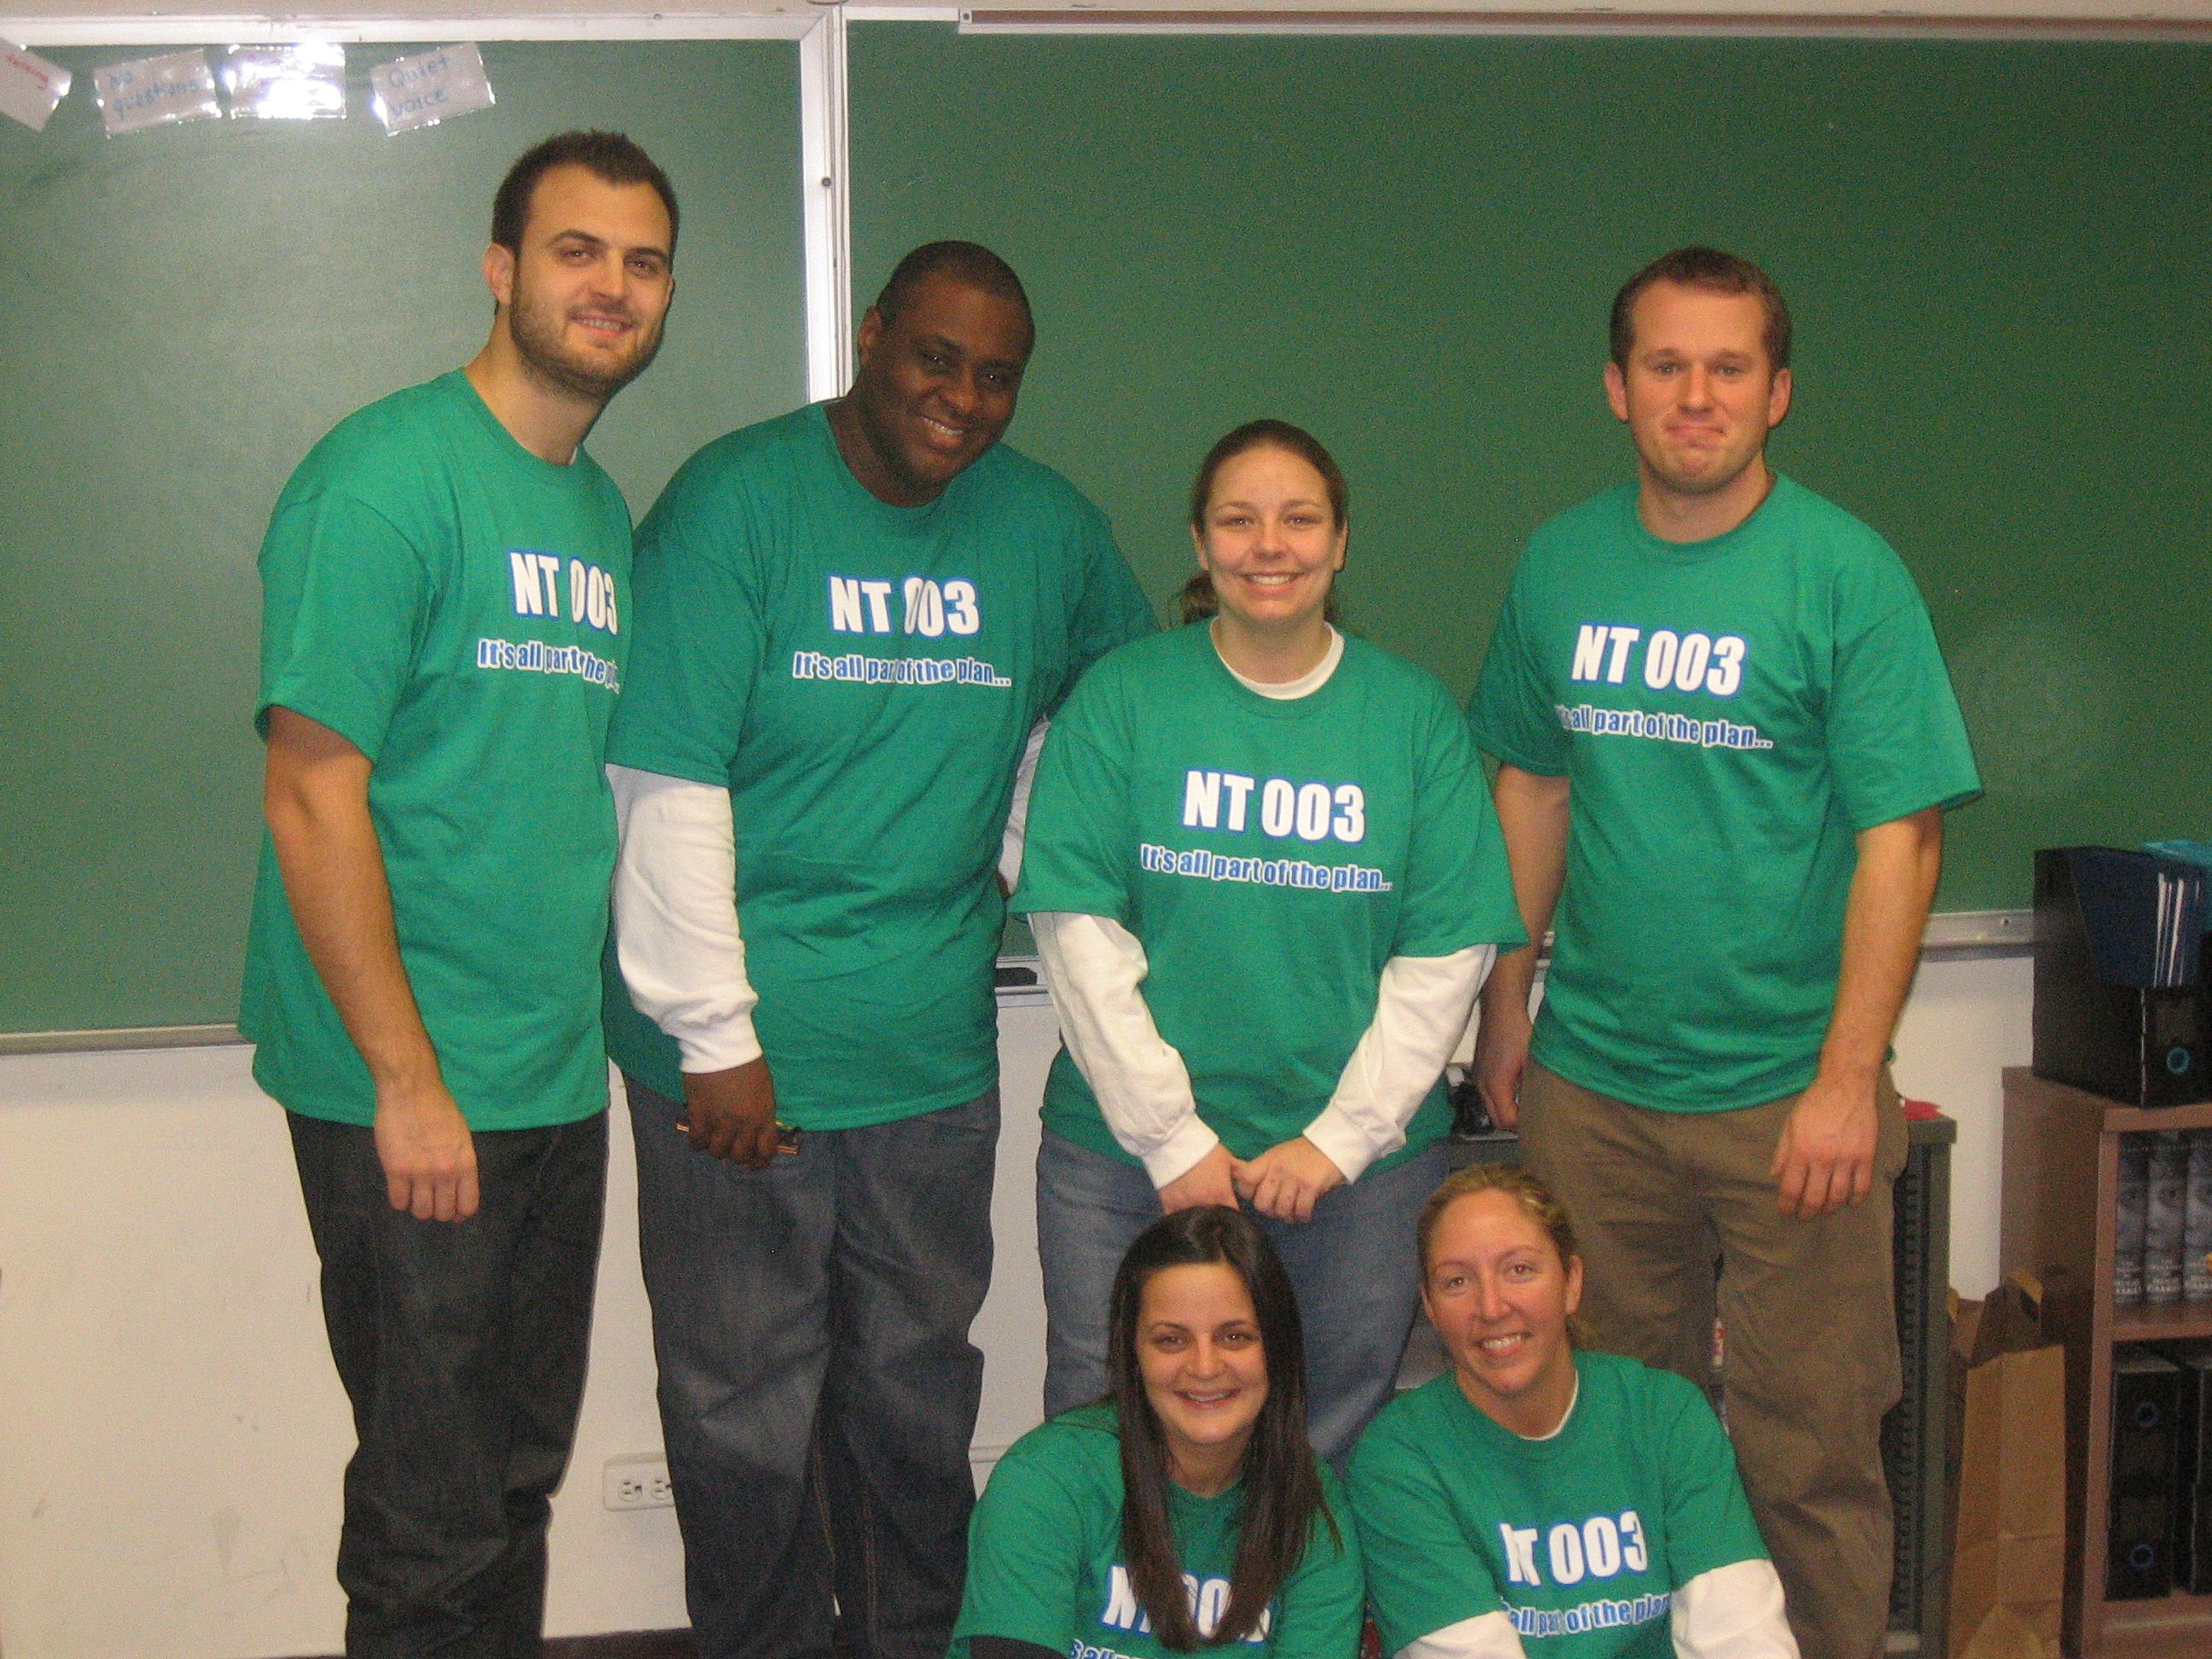 green team t shirt photo